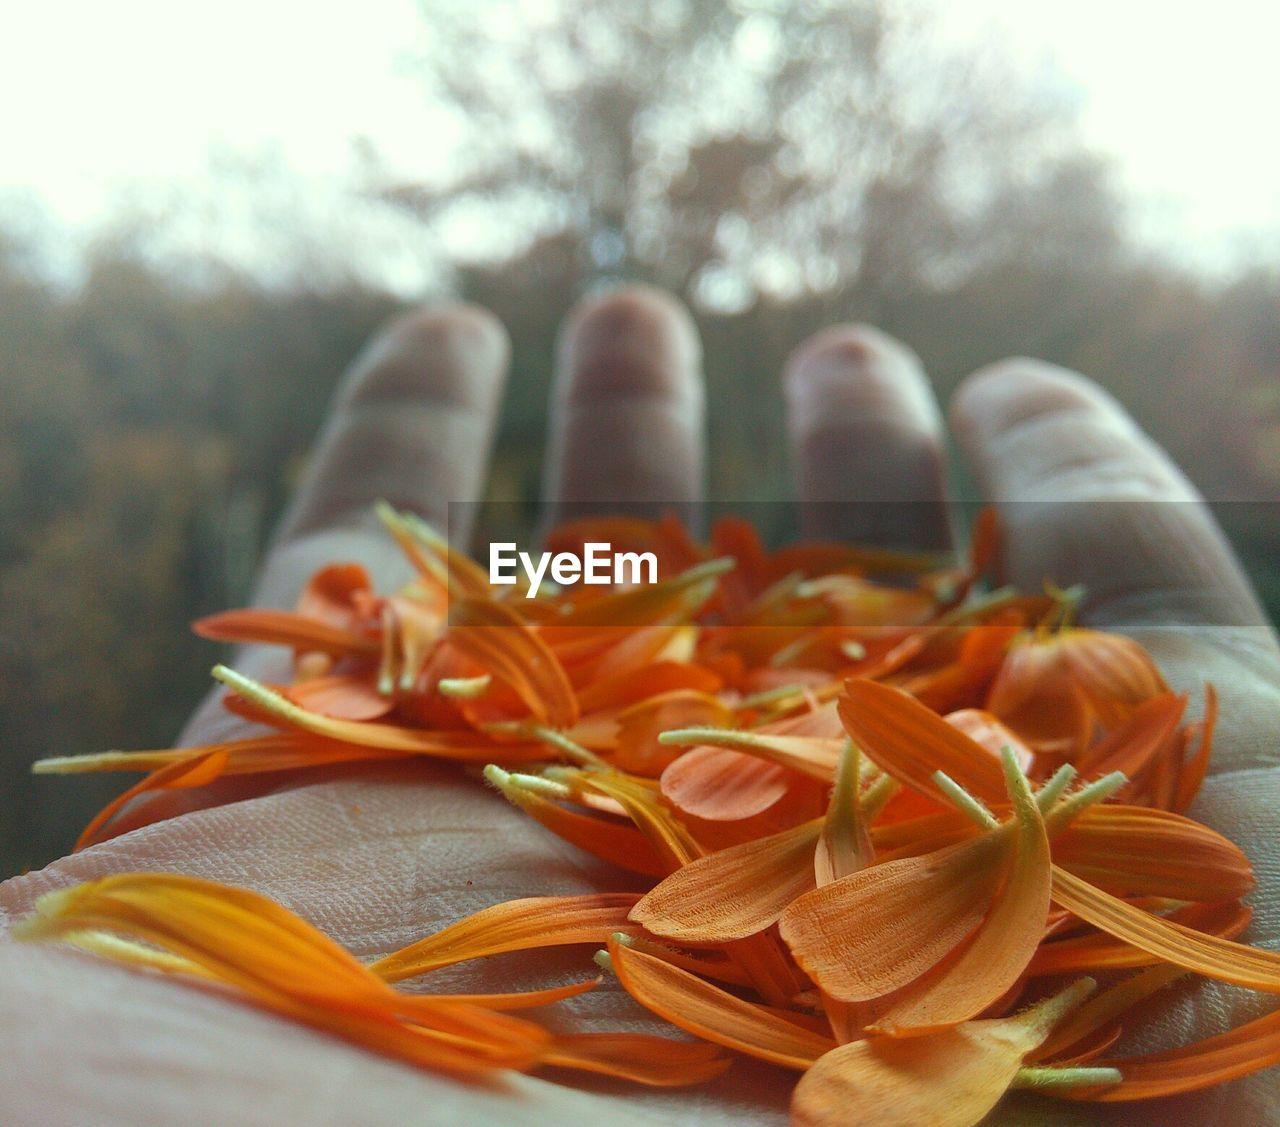 Cropped image of hand holding orange petals